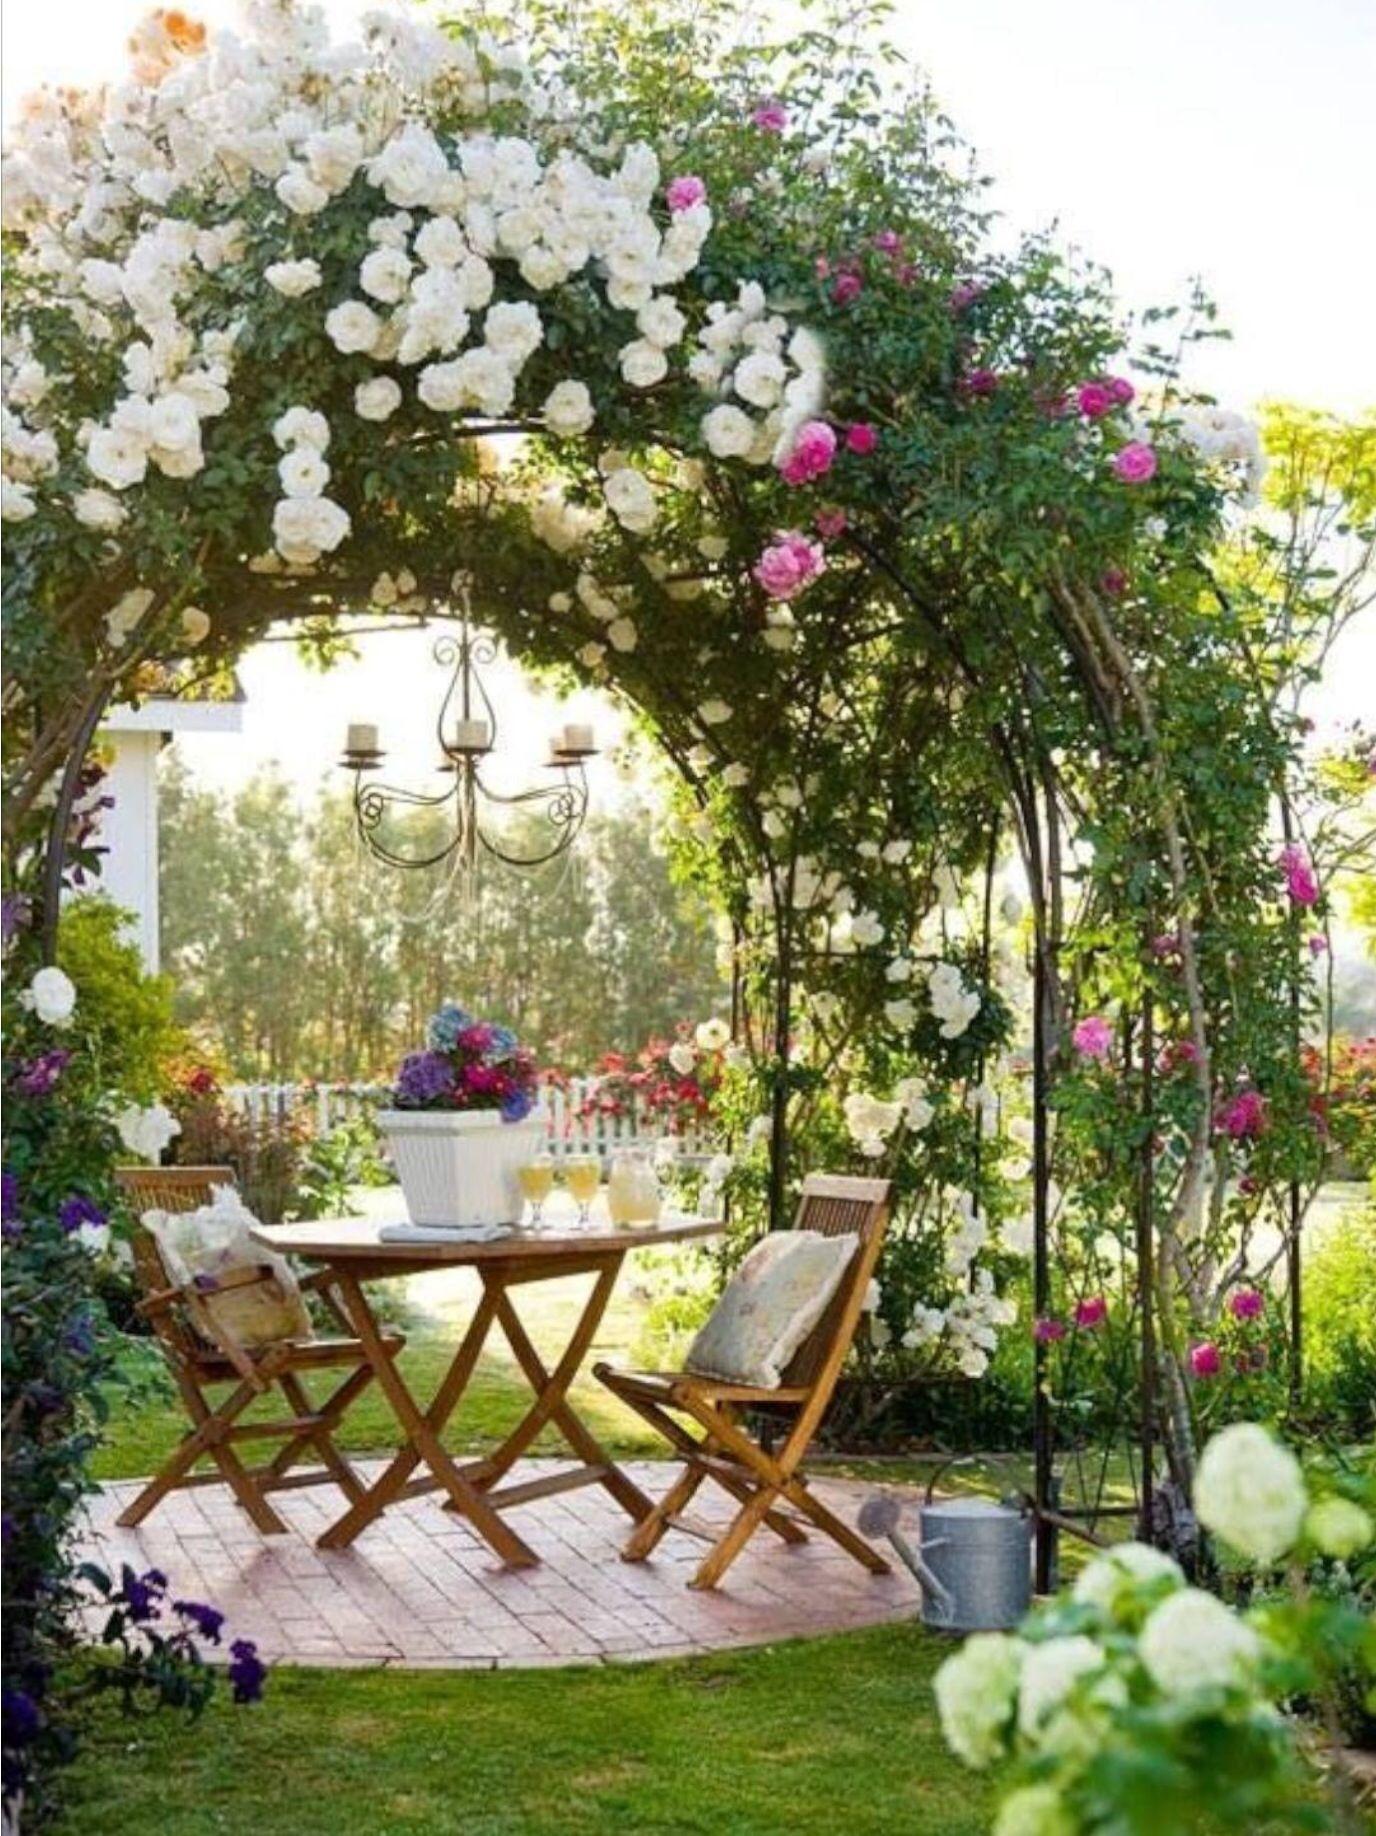 Colazione in giardino | KERT | Pinterest | Senderos de jardín ...